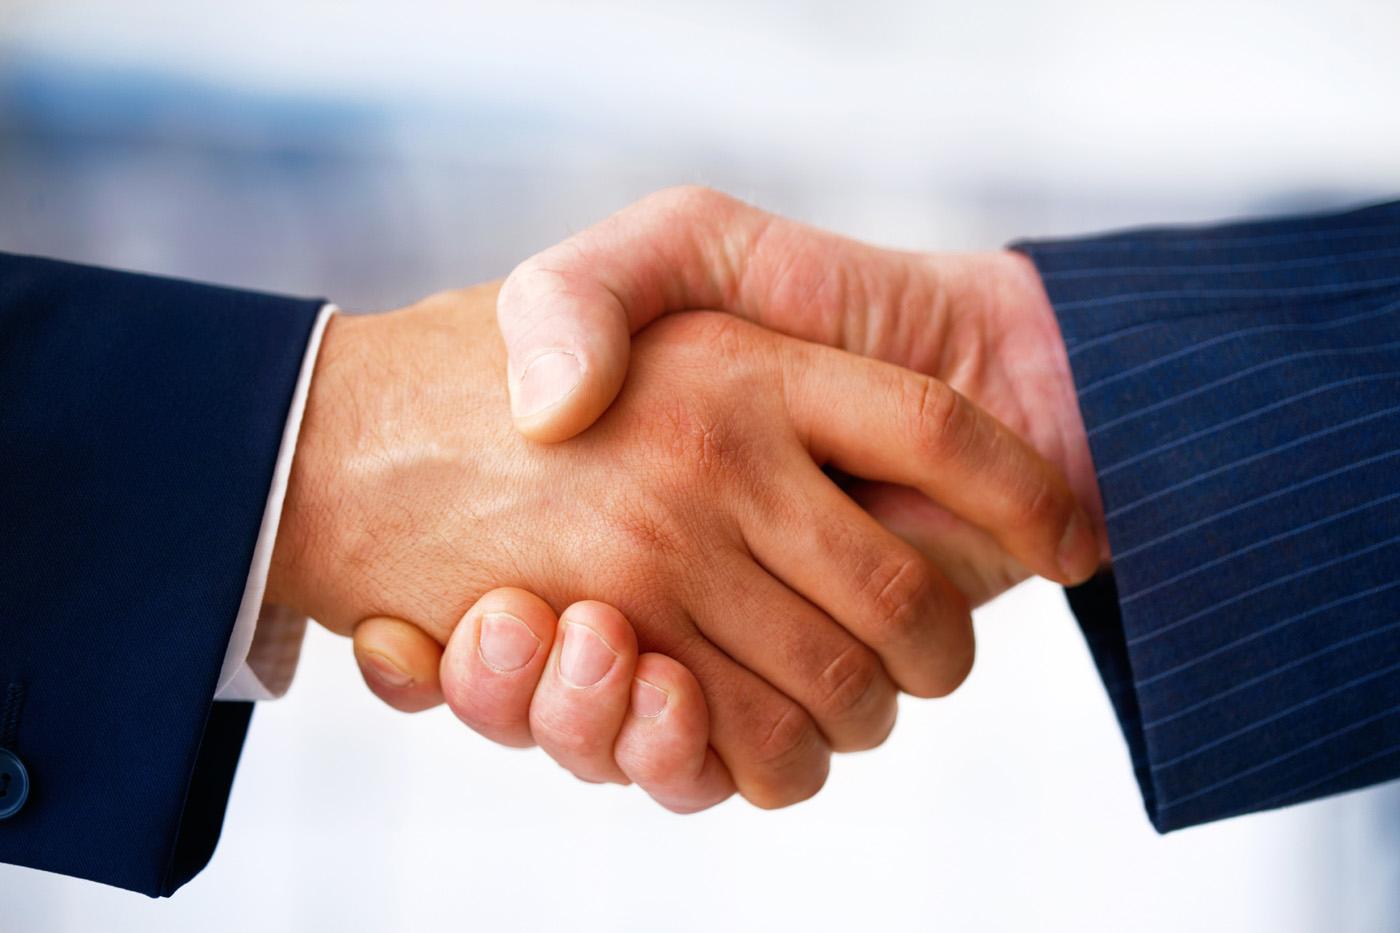 trusting handshake